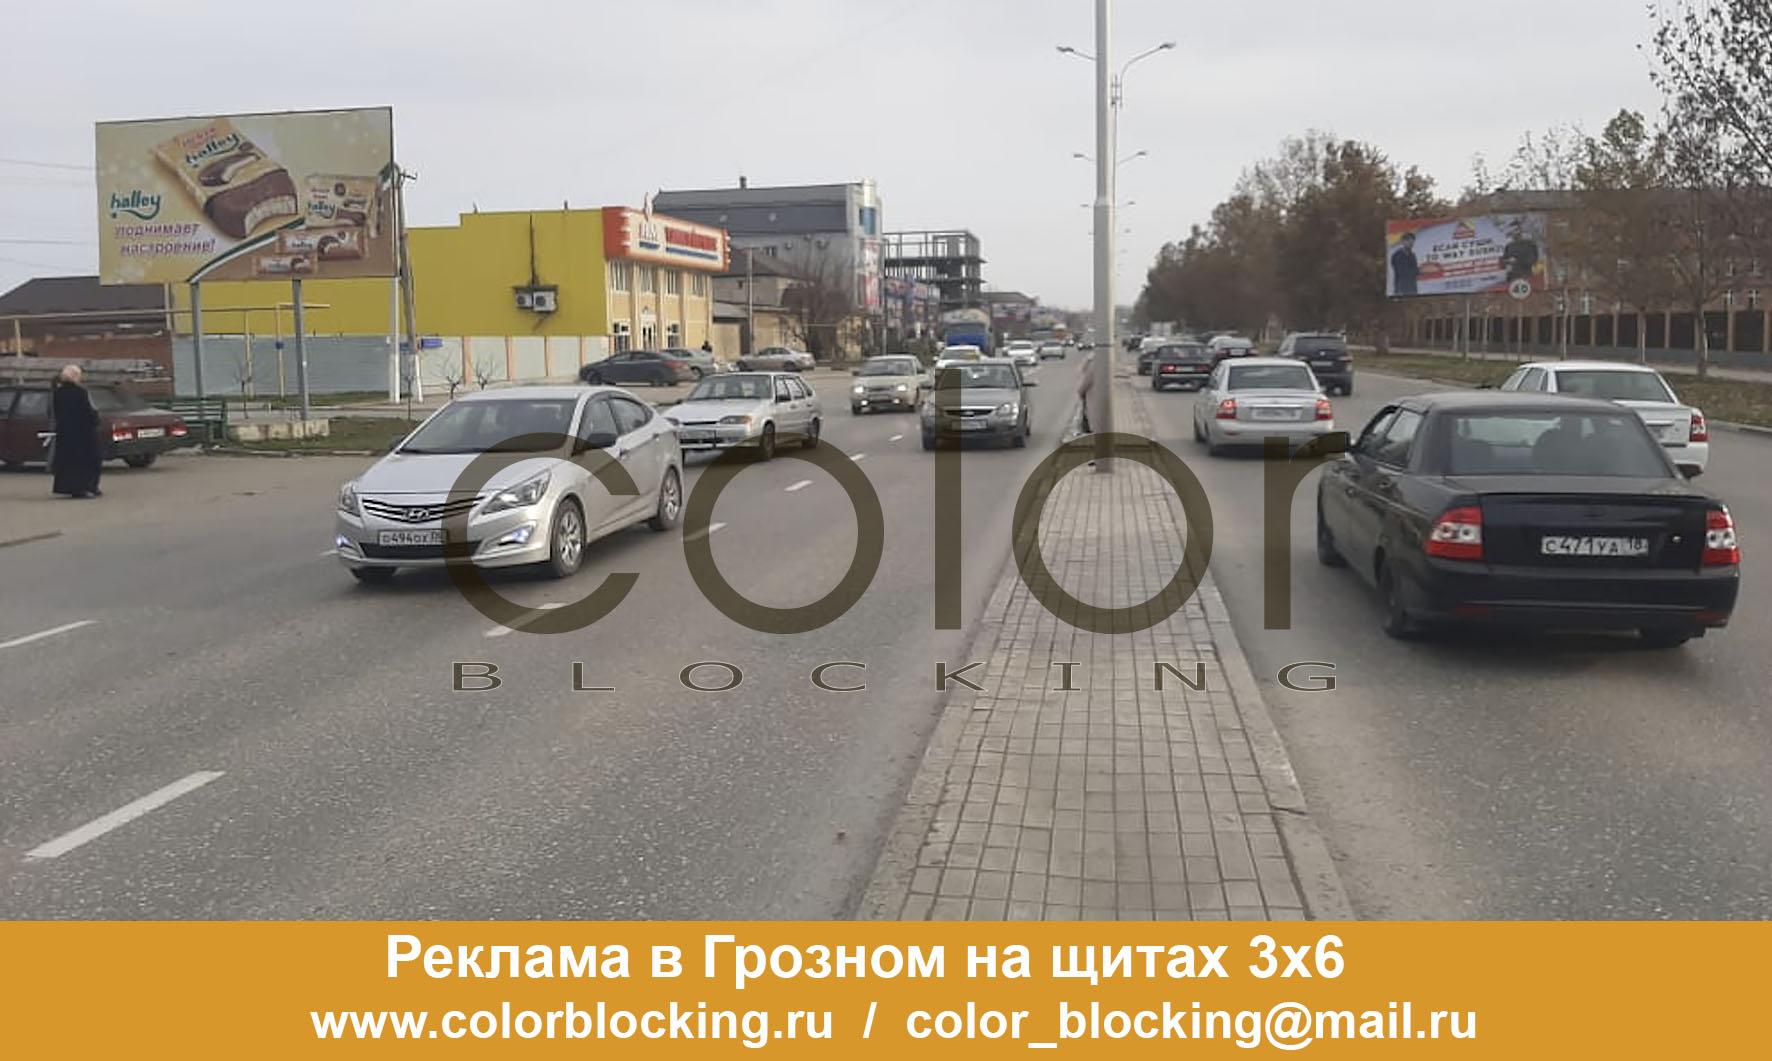 Реклама в Грозном на щитах 3х6 Жуковского